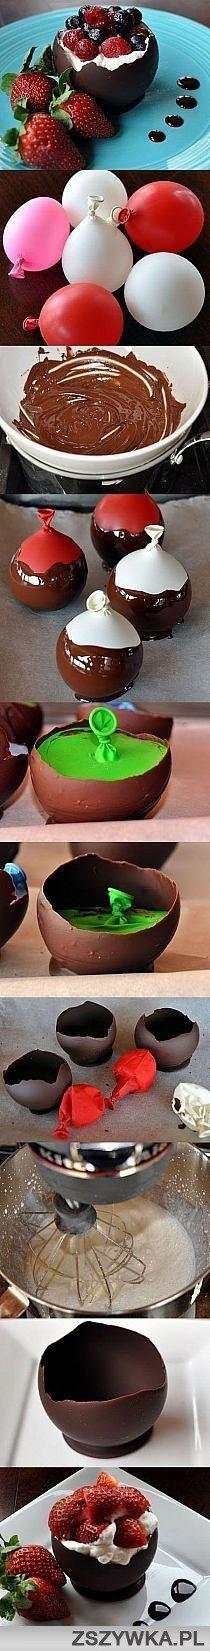 elegant and sweet dessert idea